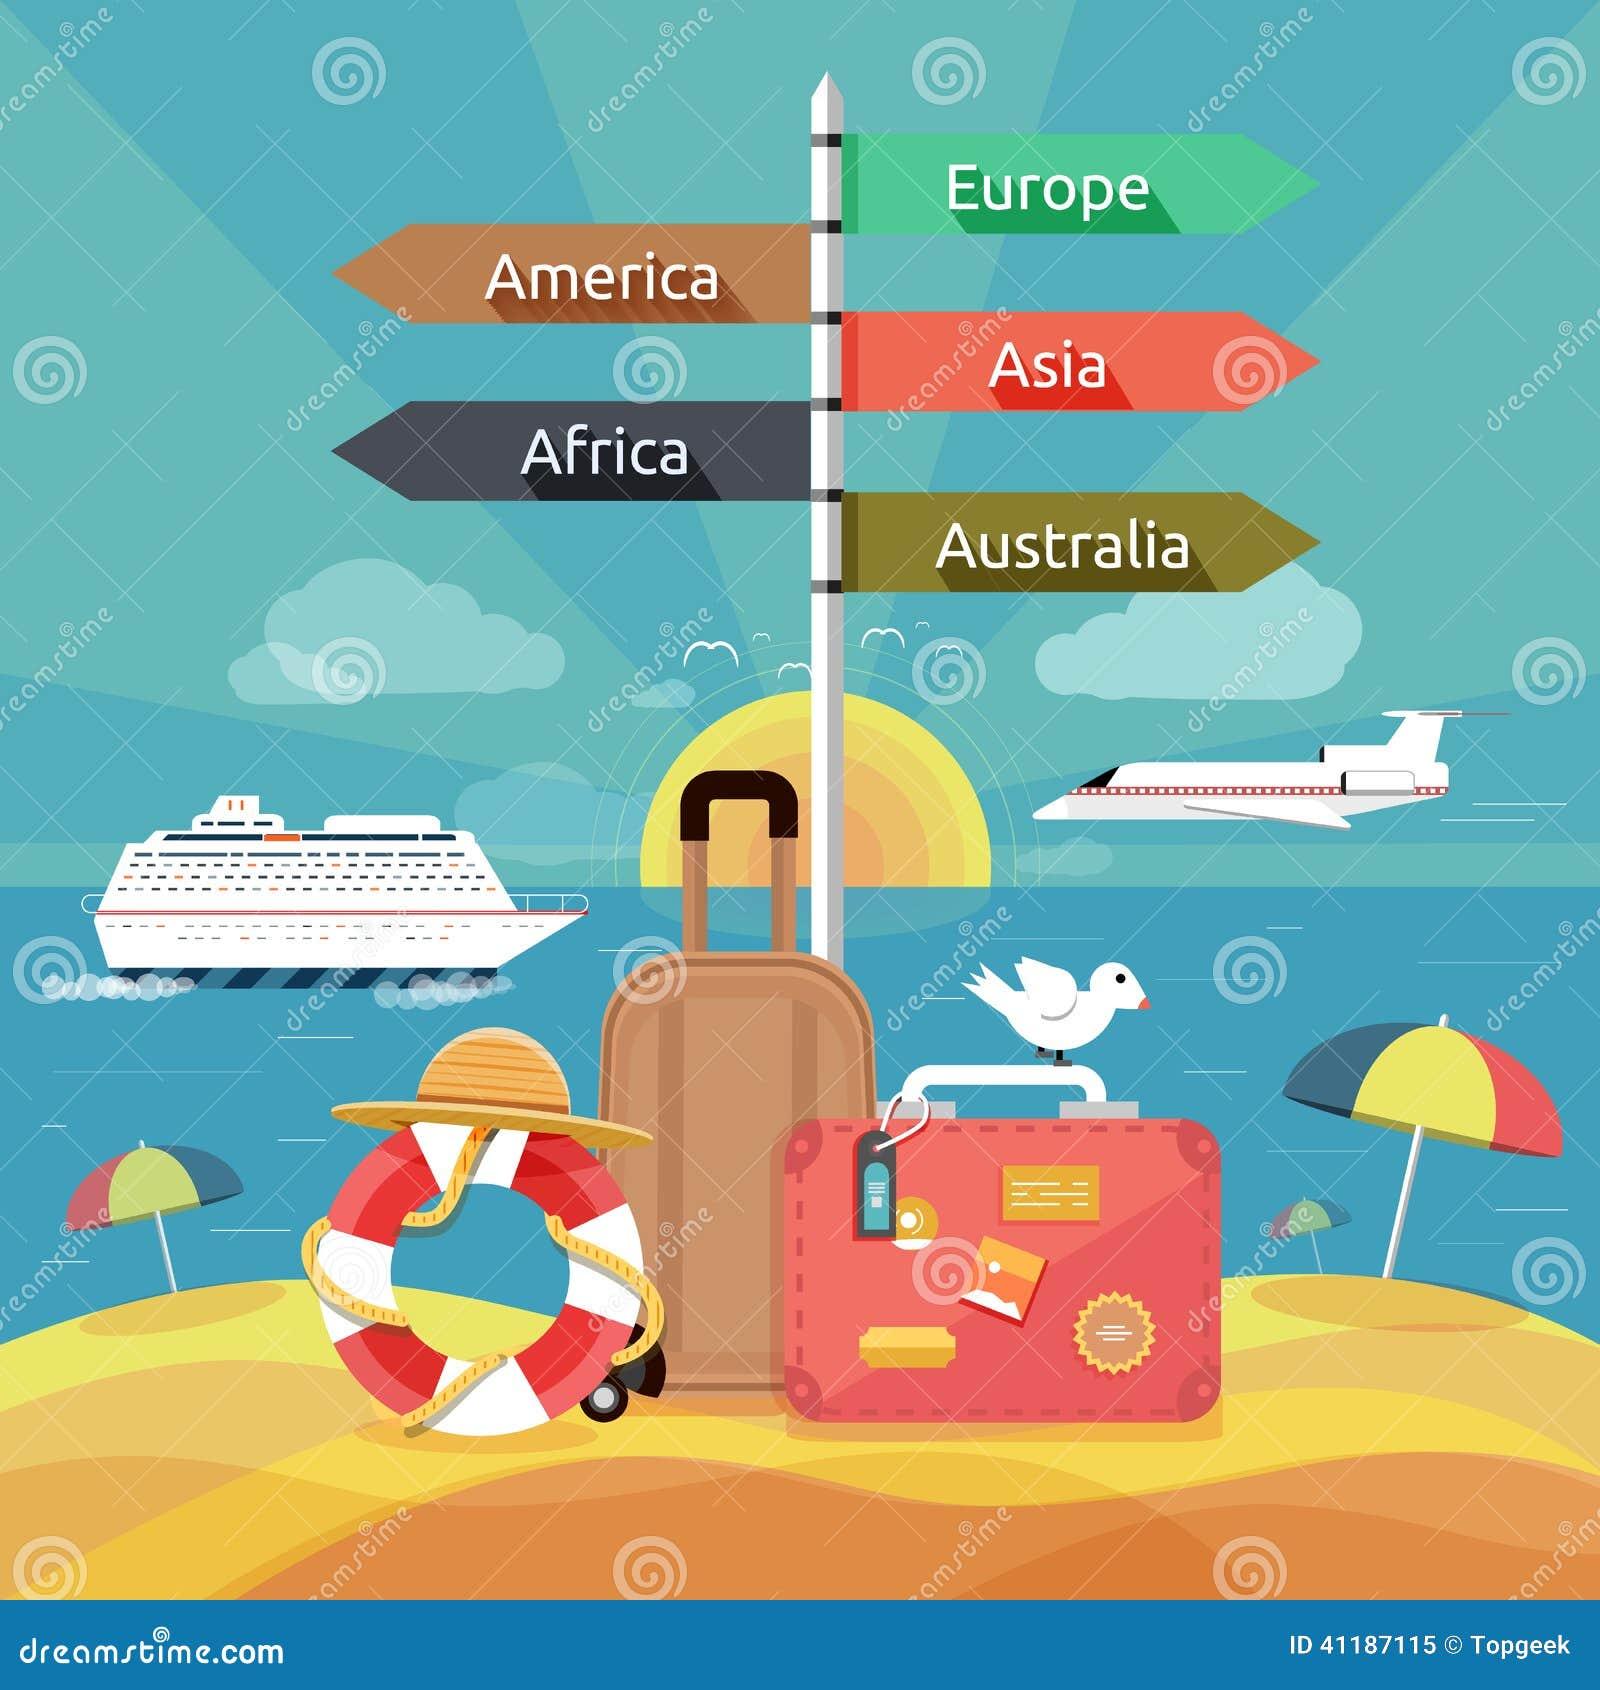 Types of Tourism